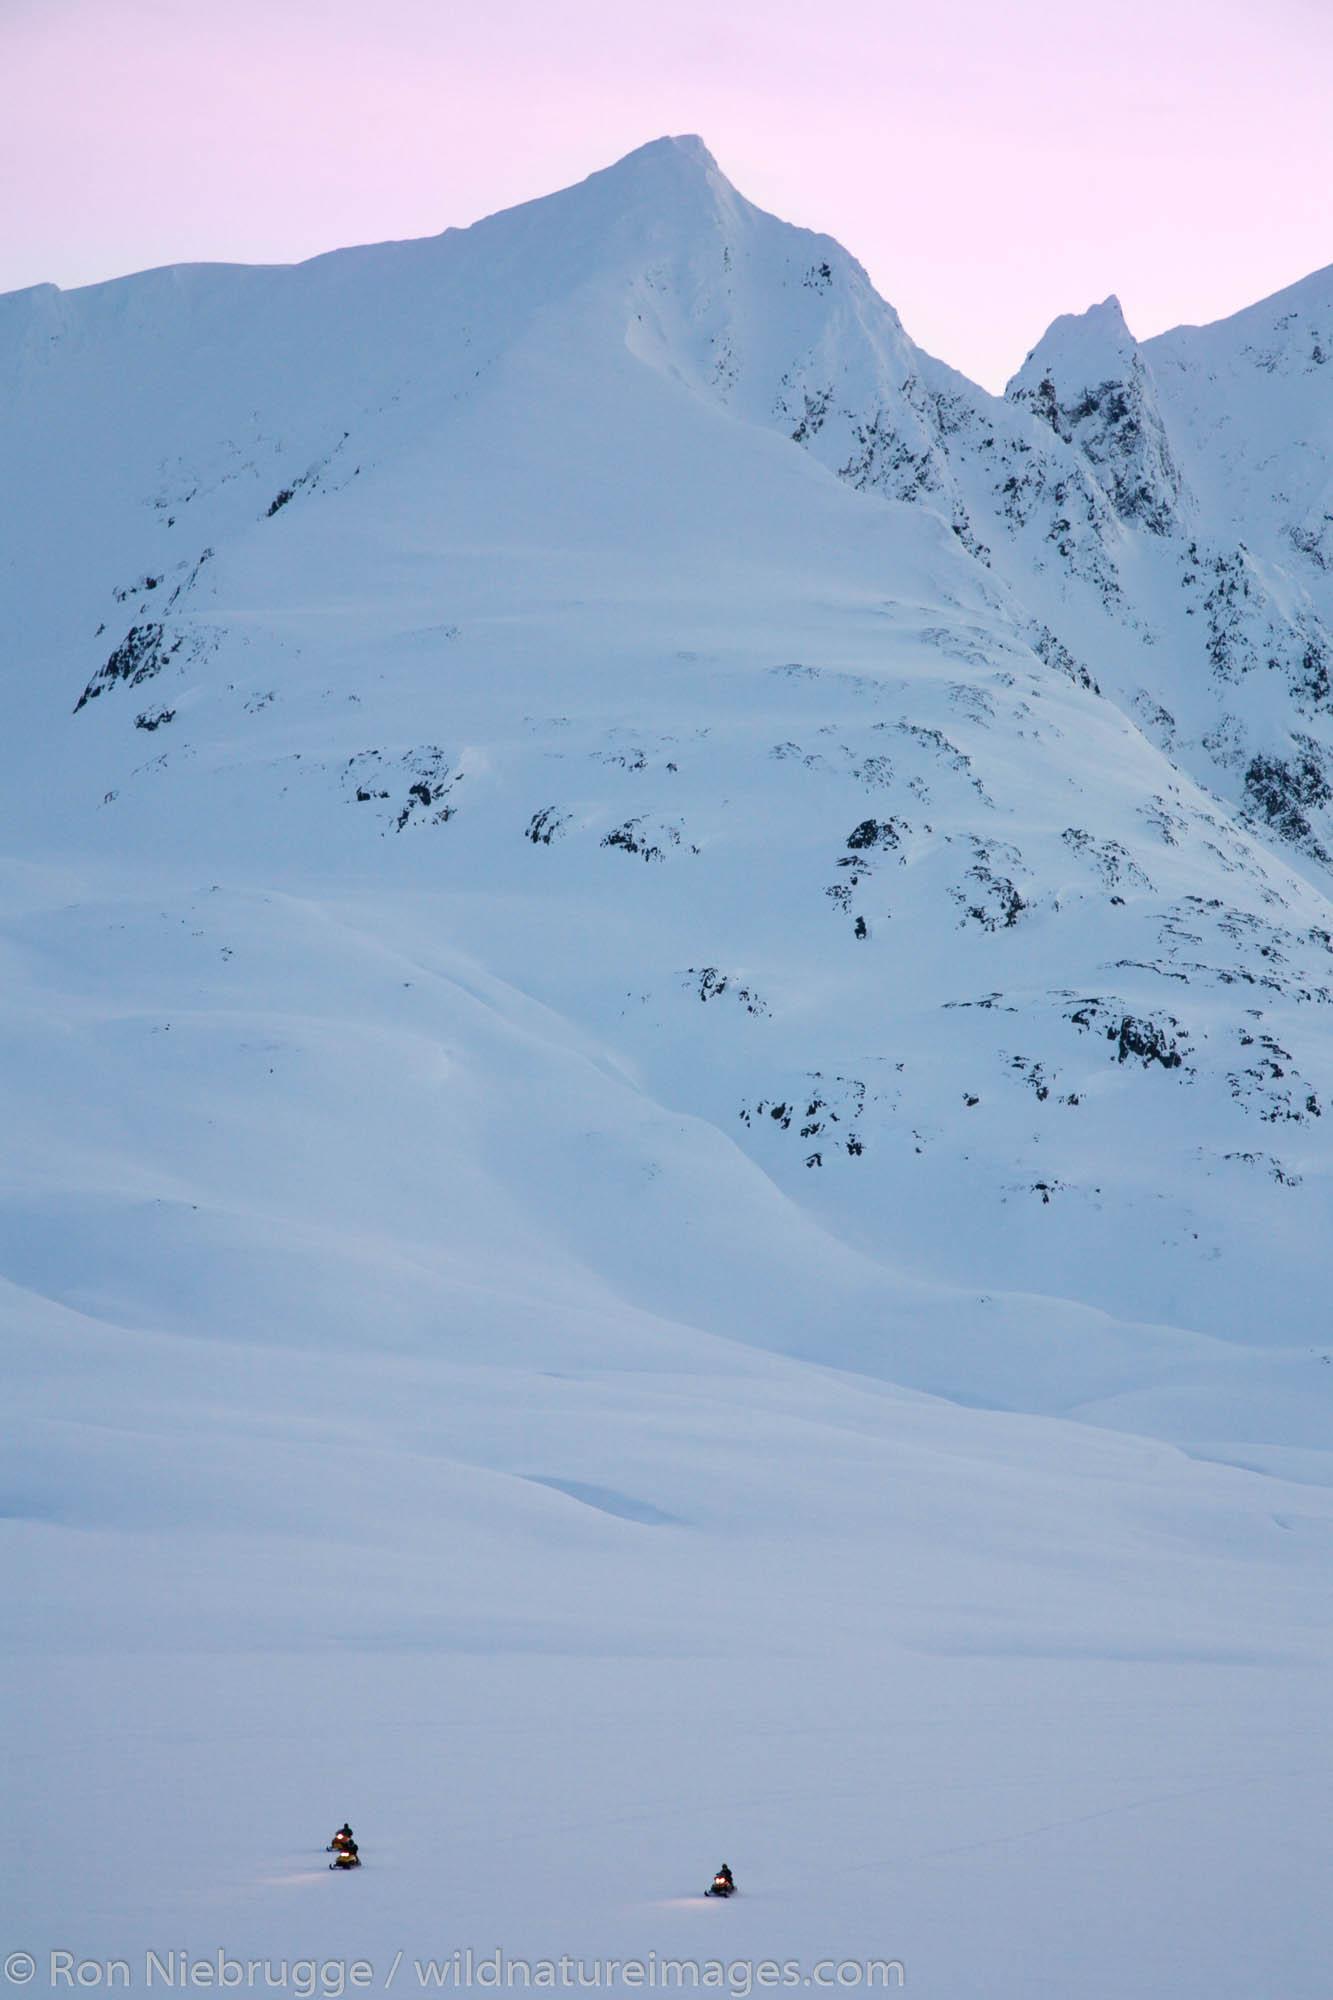 Snowmachining across Lost Lake, Chugach National Forest, near Seward, Alaska.